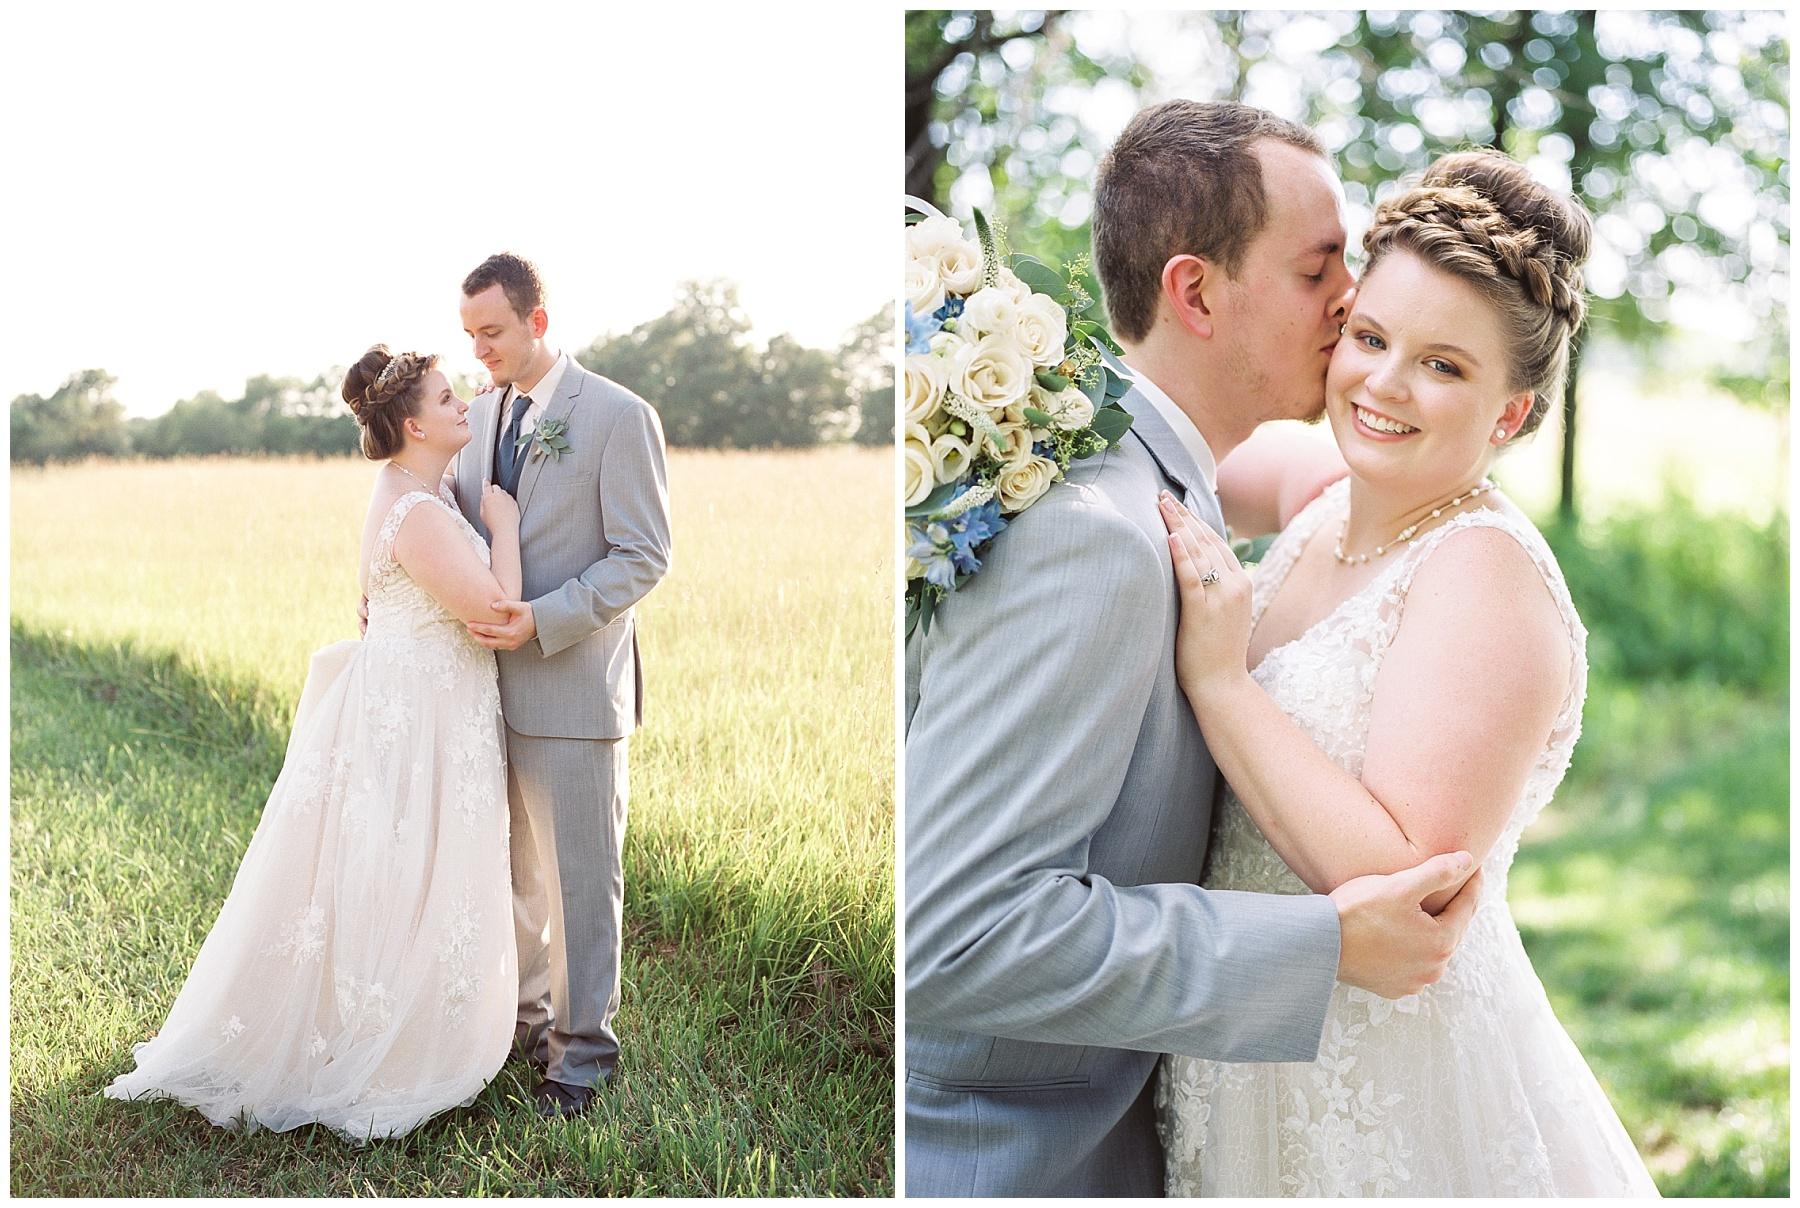 Intimate Summer Wedding at Emerson Fields by Kelsi Kliethermes Photography Best Missouri and Maui Wedding Photographer_0037.jpg